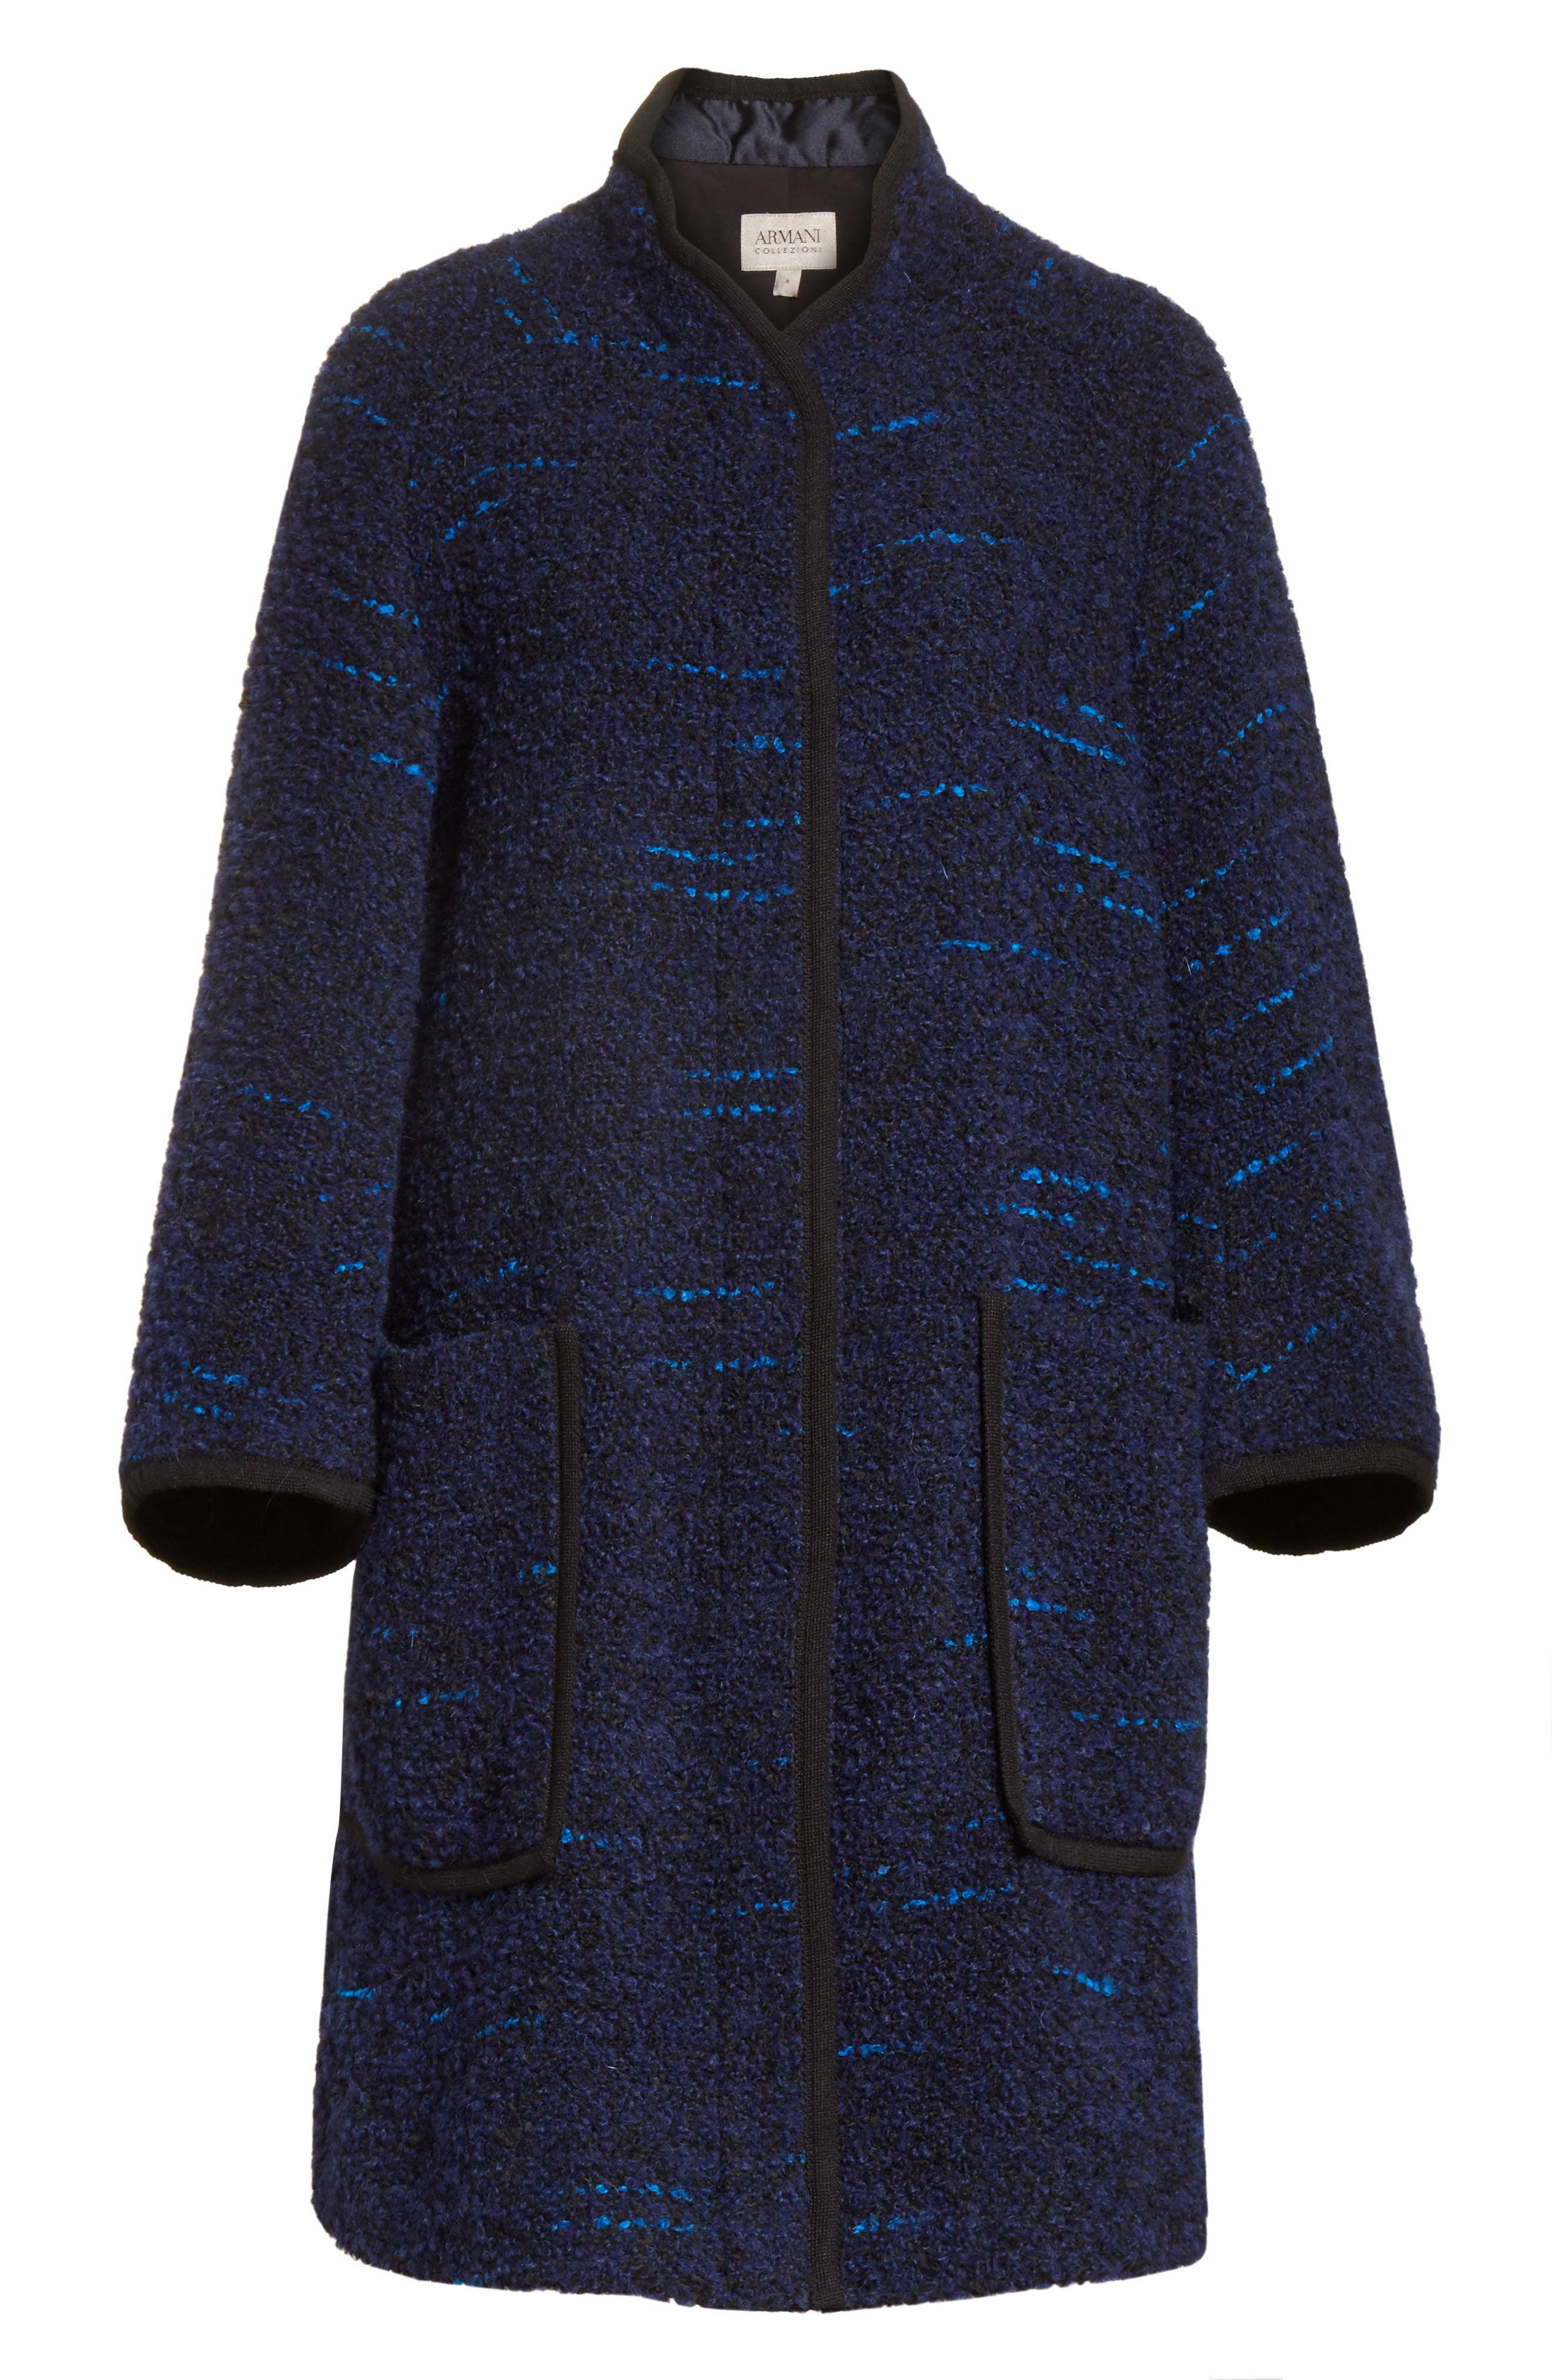 Wool Blend Swing Coat,                             Alternate thumbnail 8, color,                             Navy / Blue Multi